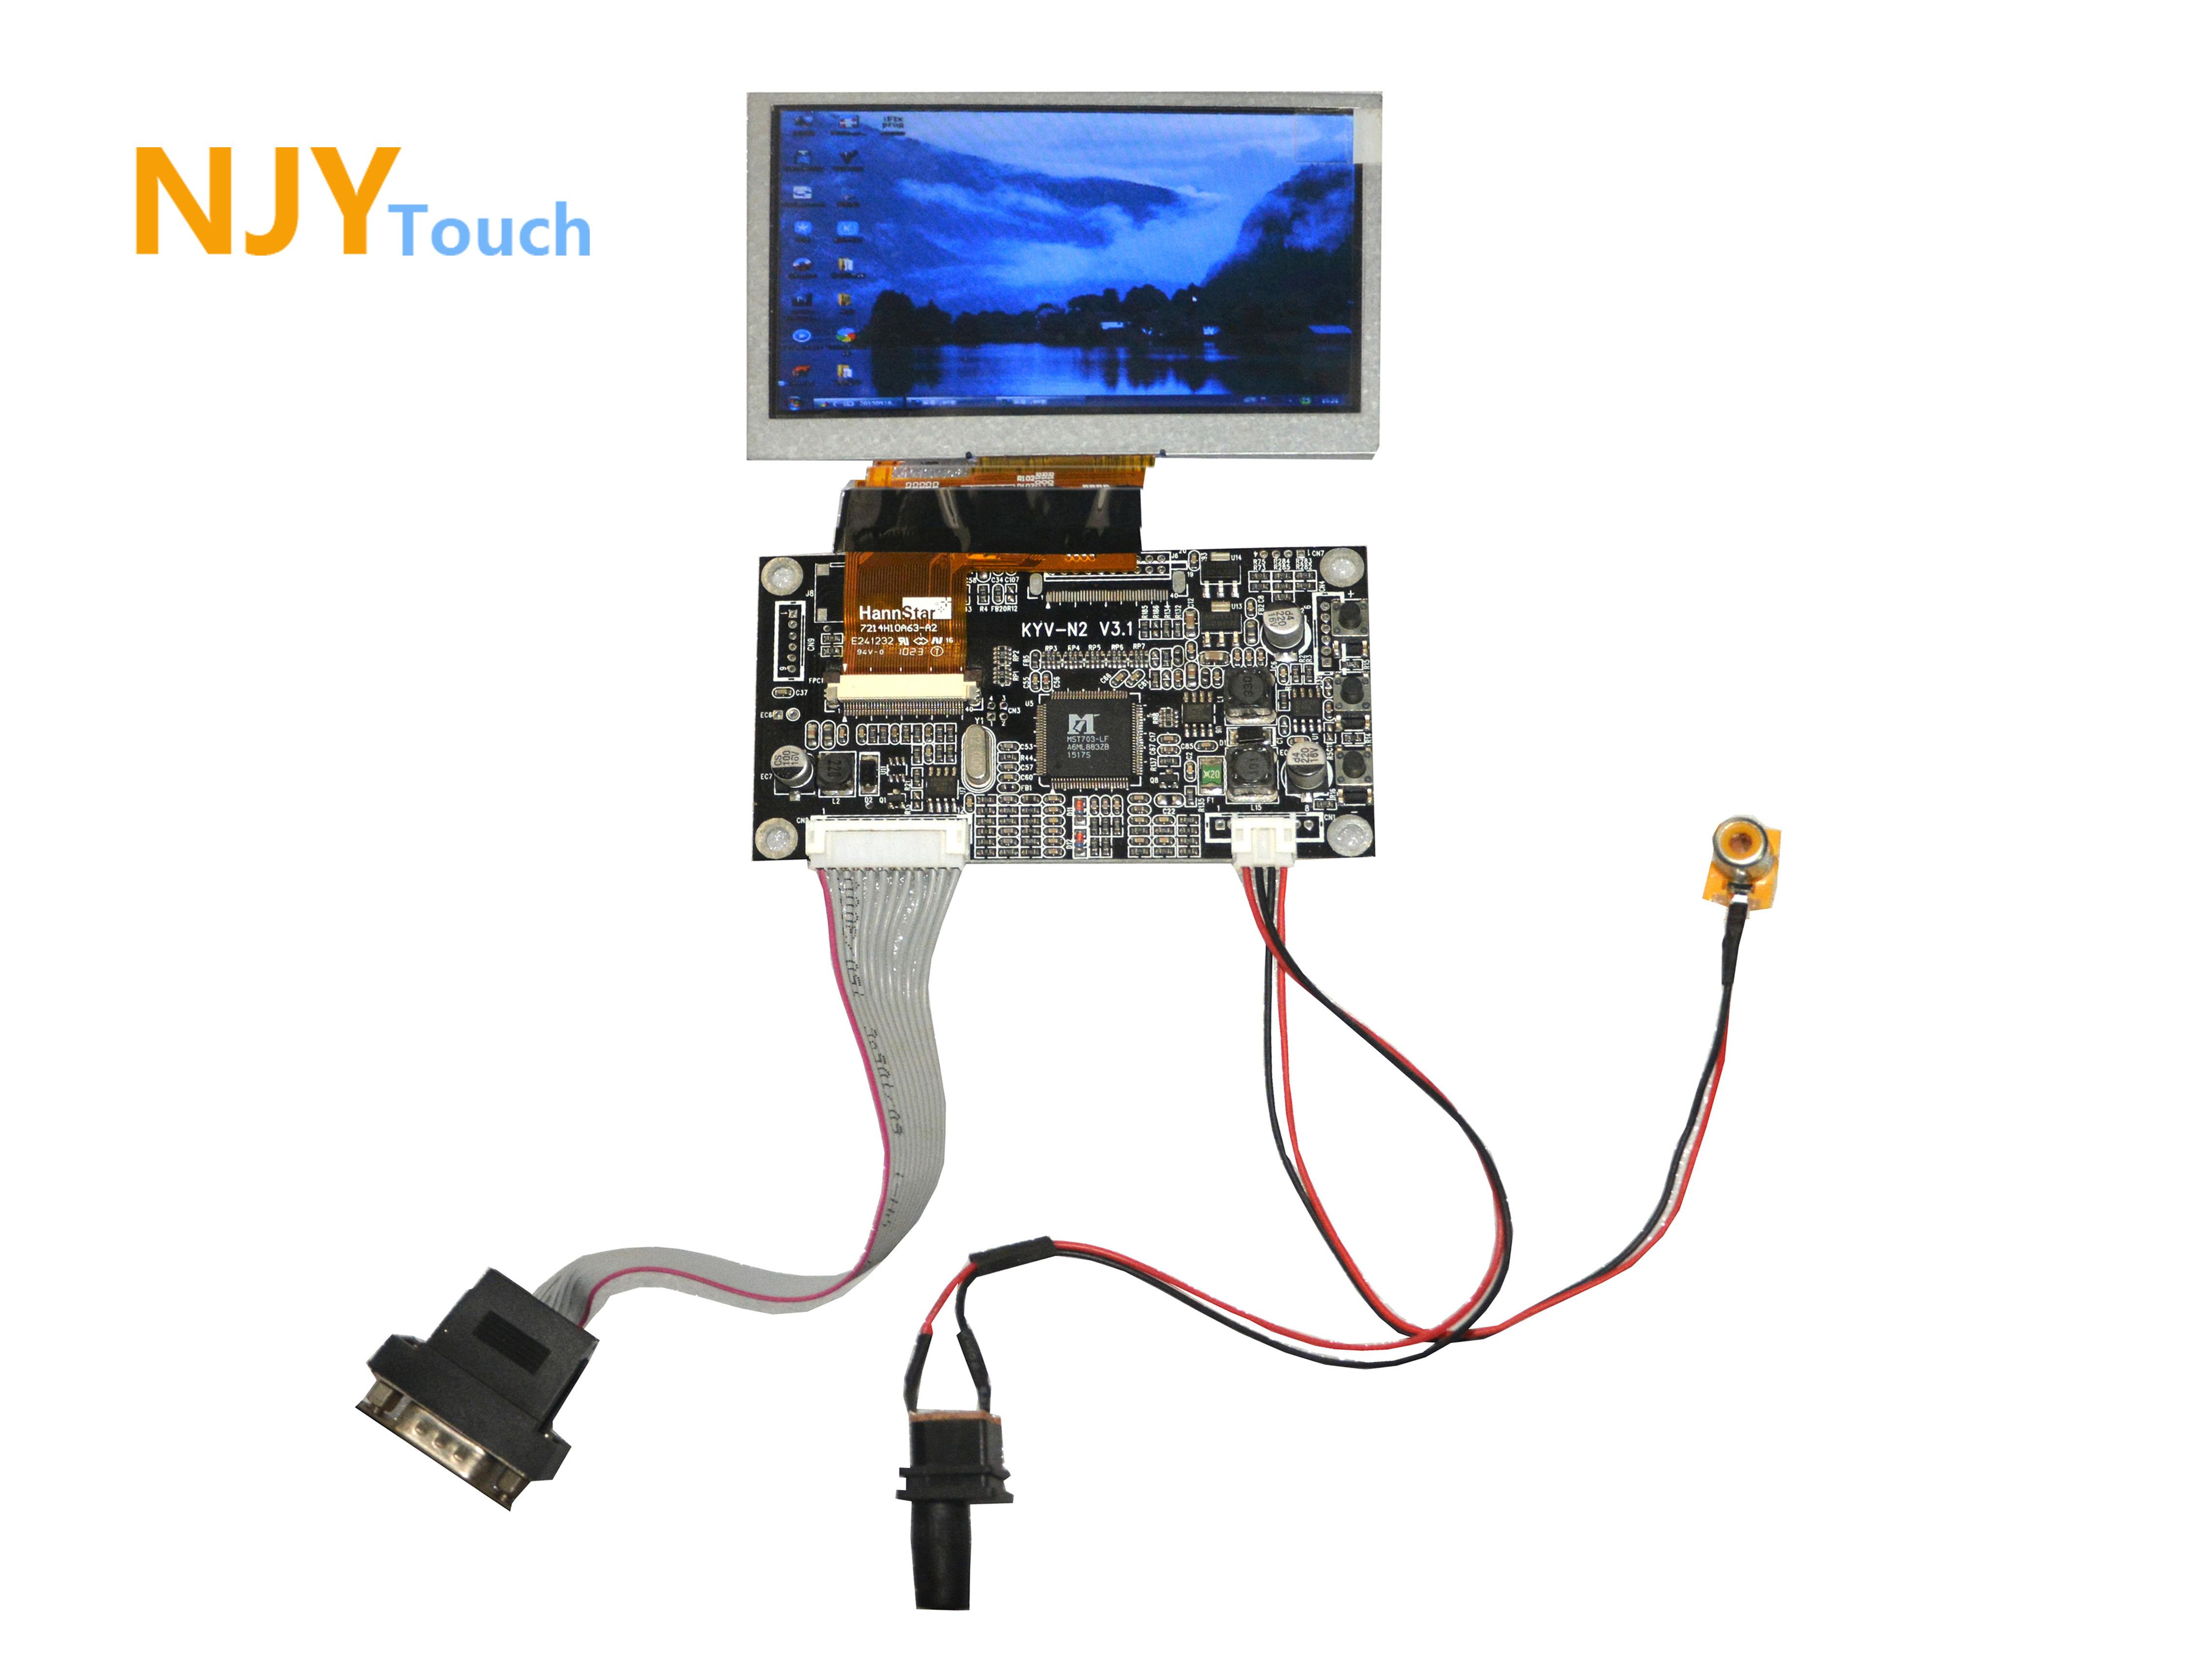 NJYTouch KYV N2 V3.1 VGA AV LCD Controller Board For 4.3inch HSD043I9W1 480x272 LCD Screen